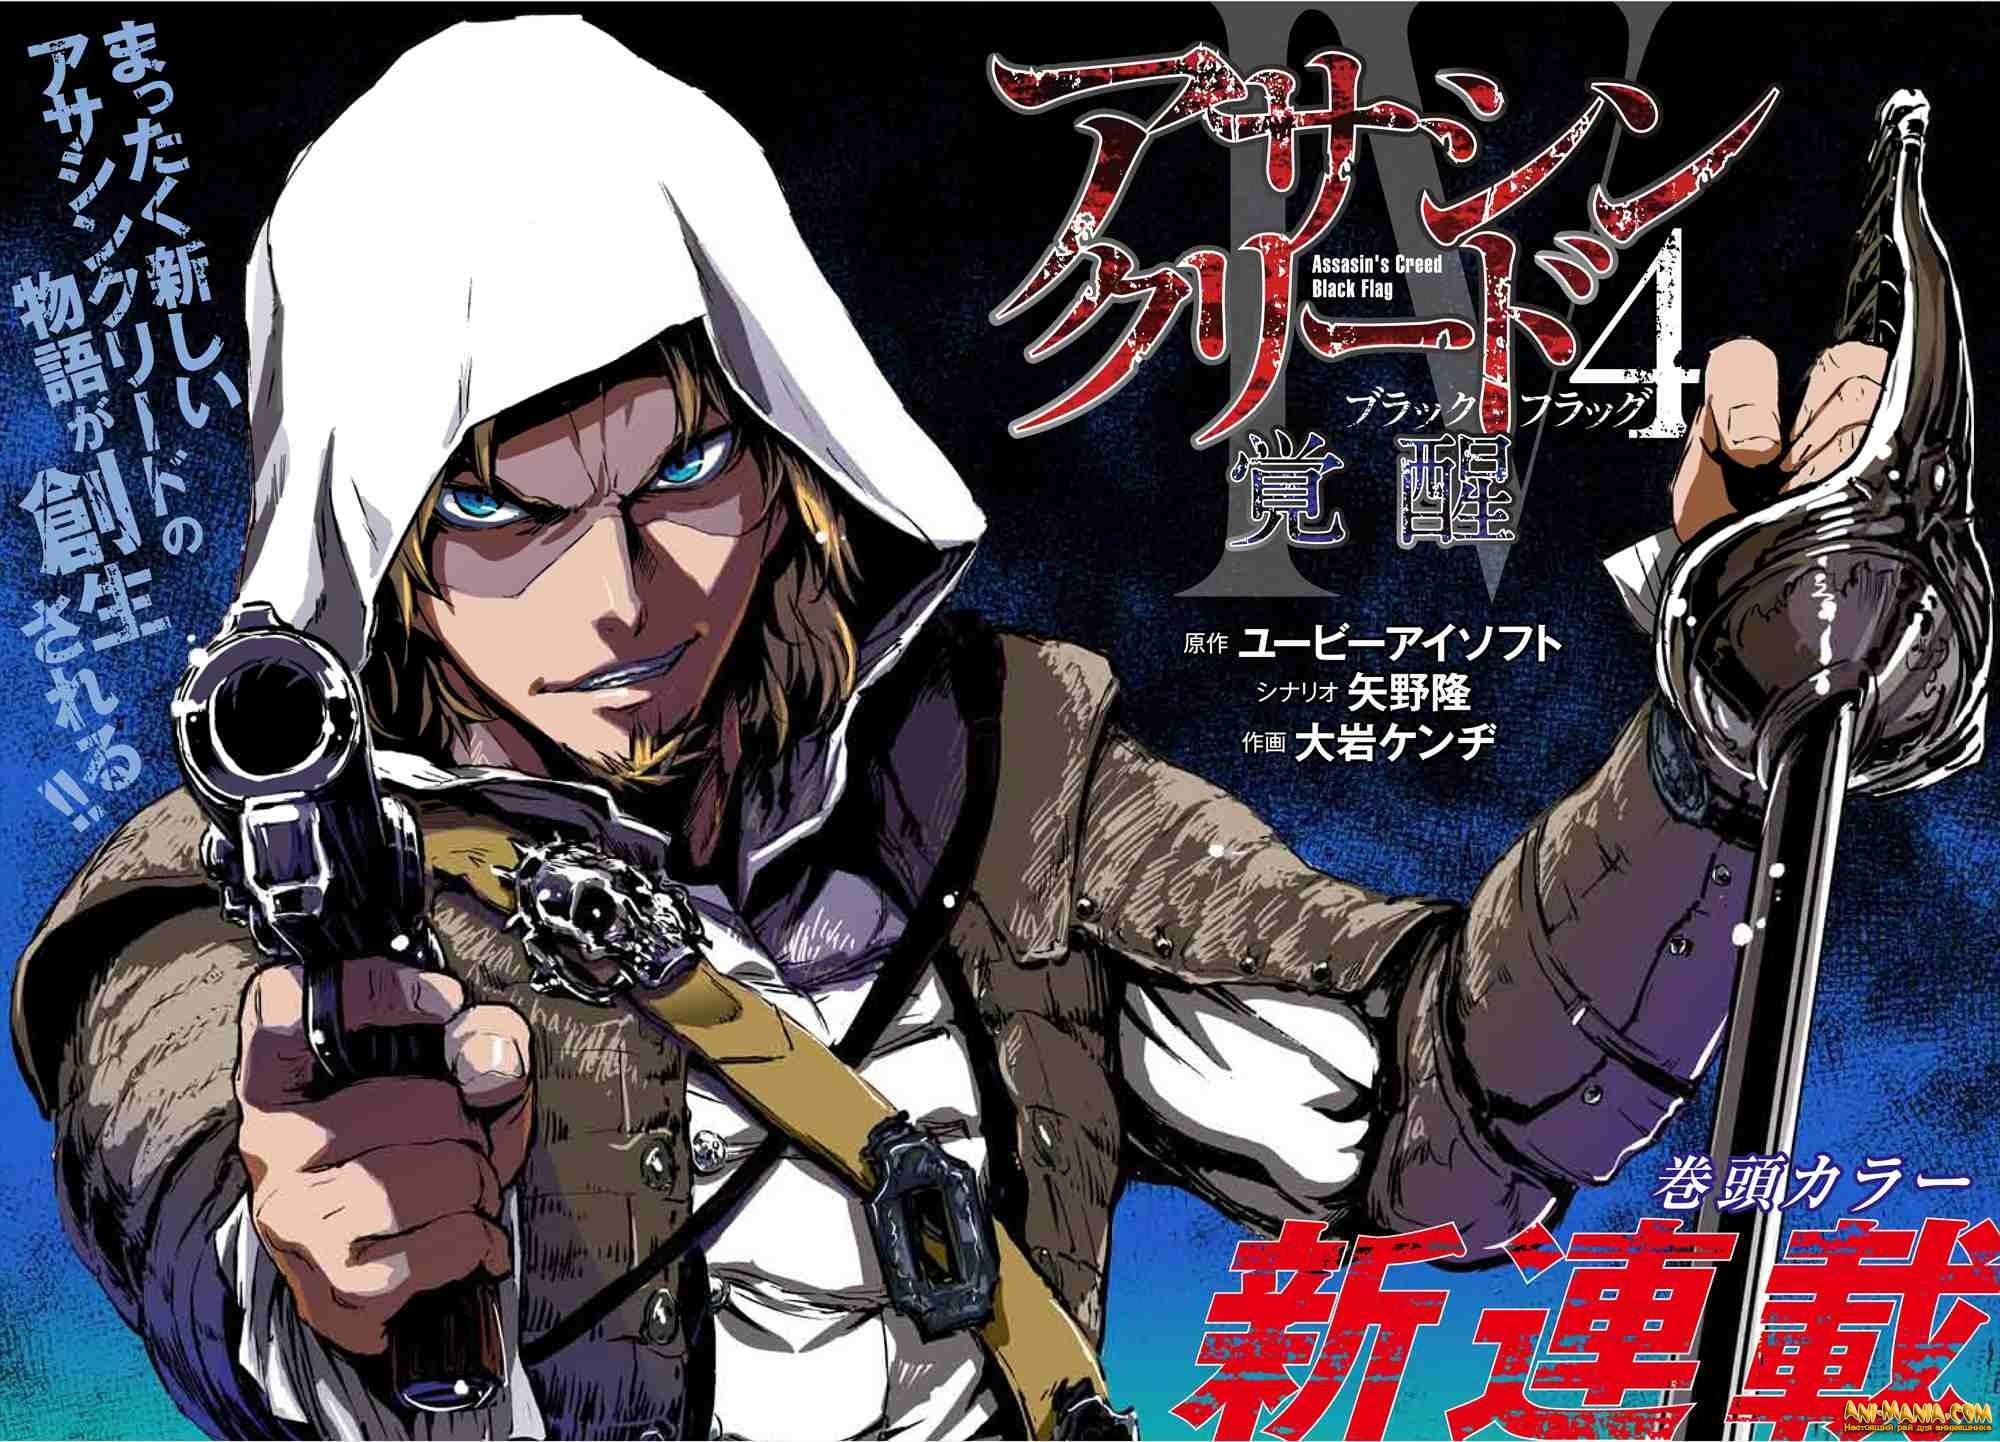 Манга по игре «Assassin's Creed IV: Black Flag»